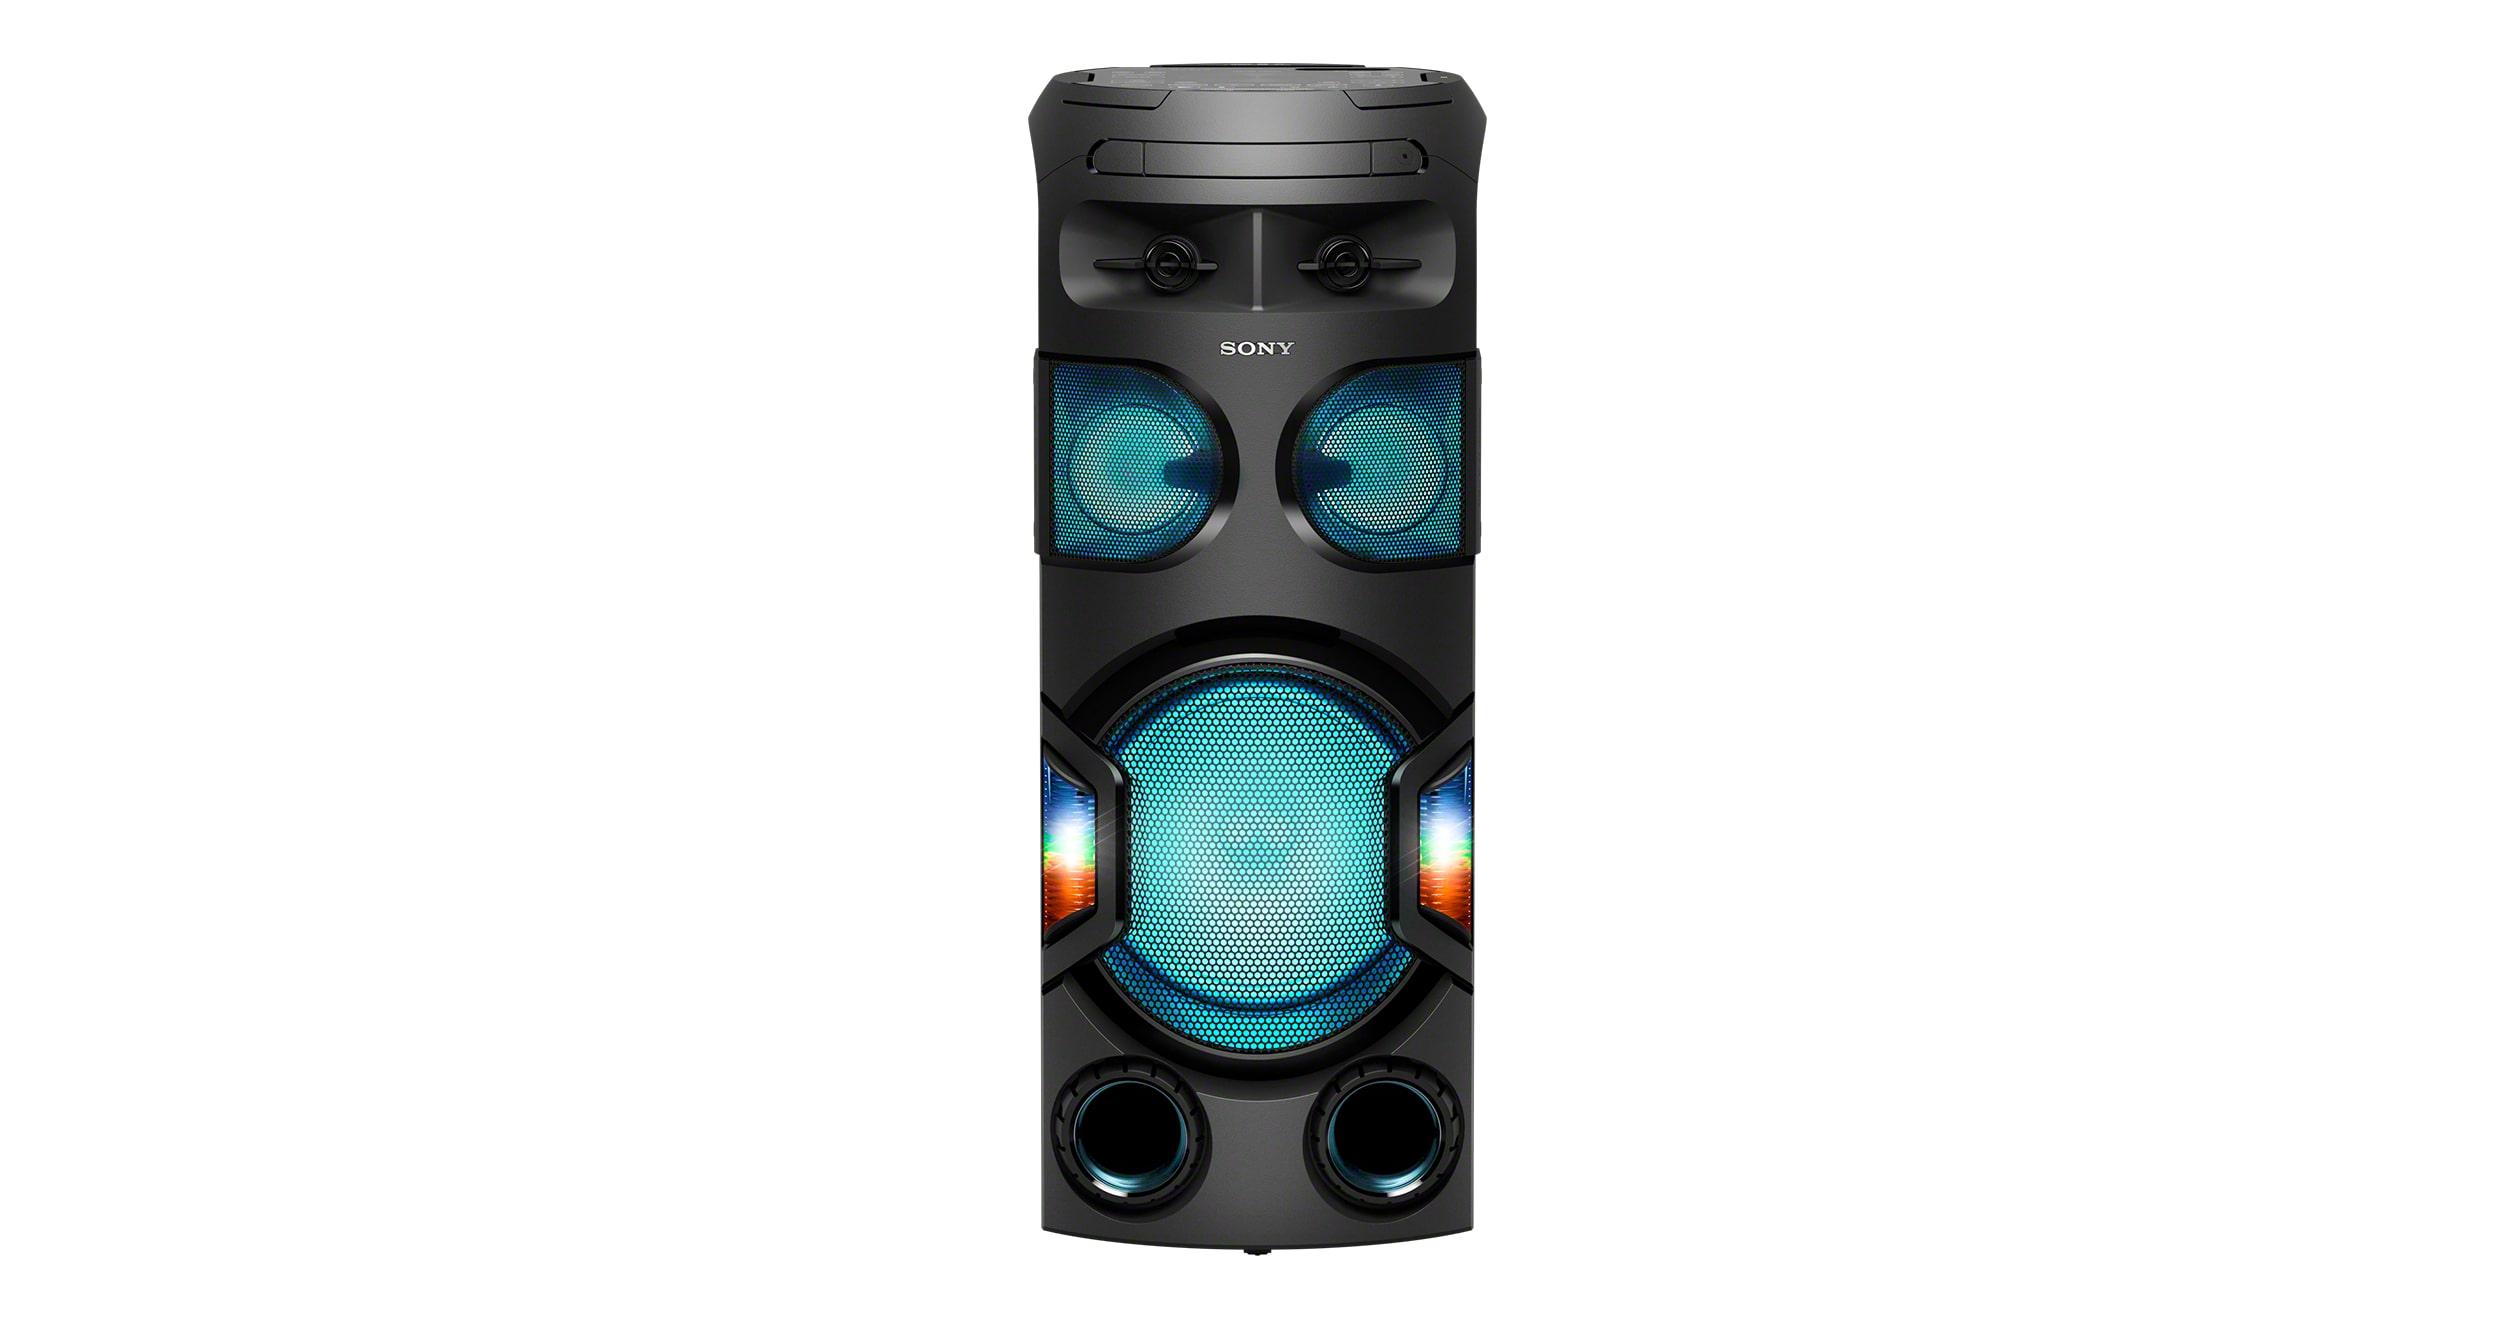 34e5a03b9b6 MHC-V72D Wireless Speaker with 360° Bass Sound